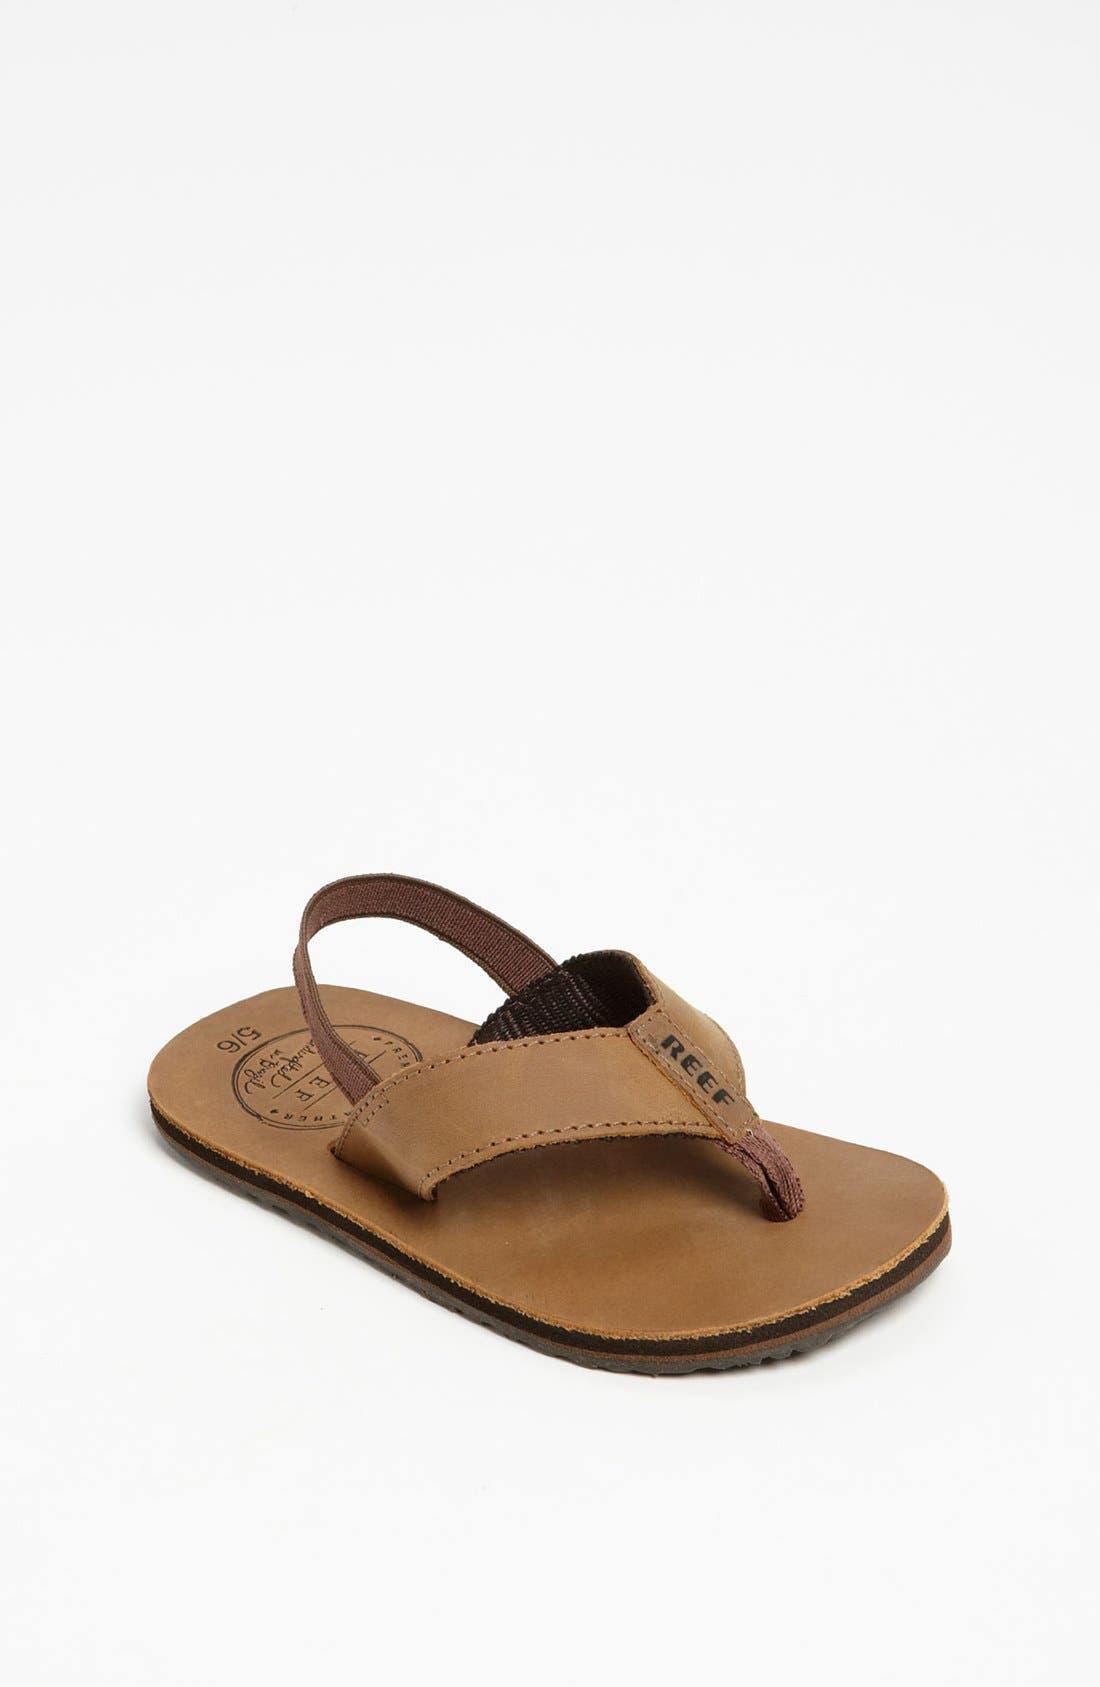 'Grom' Leather Flip-Flop,                             Main thumbnail 1, color,                             BRONZE BROWN